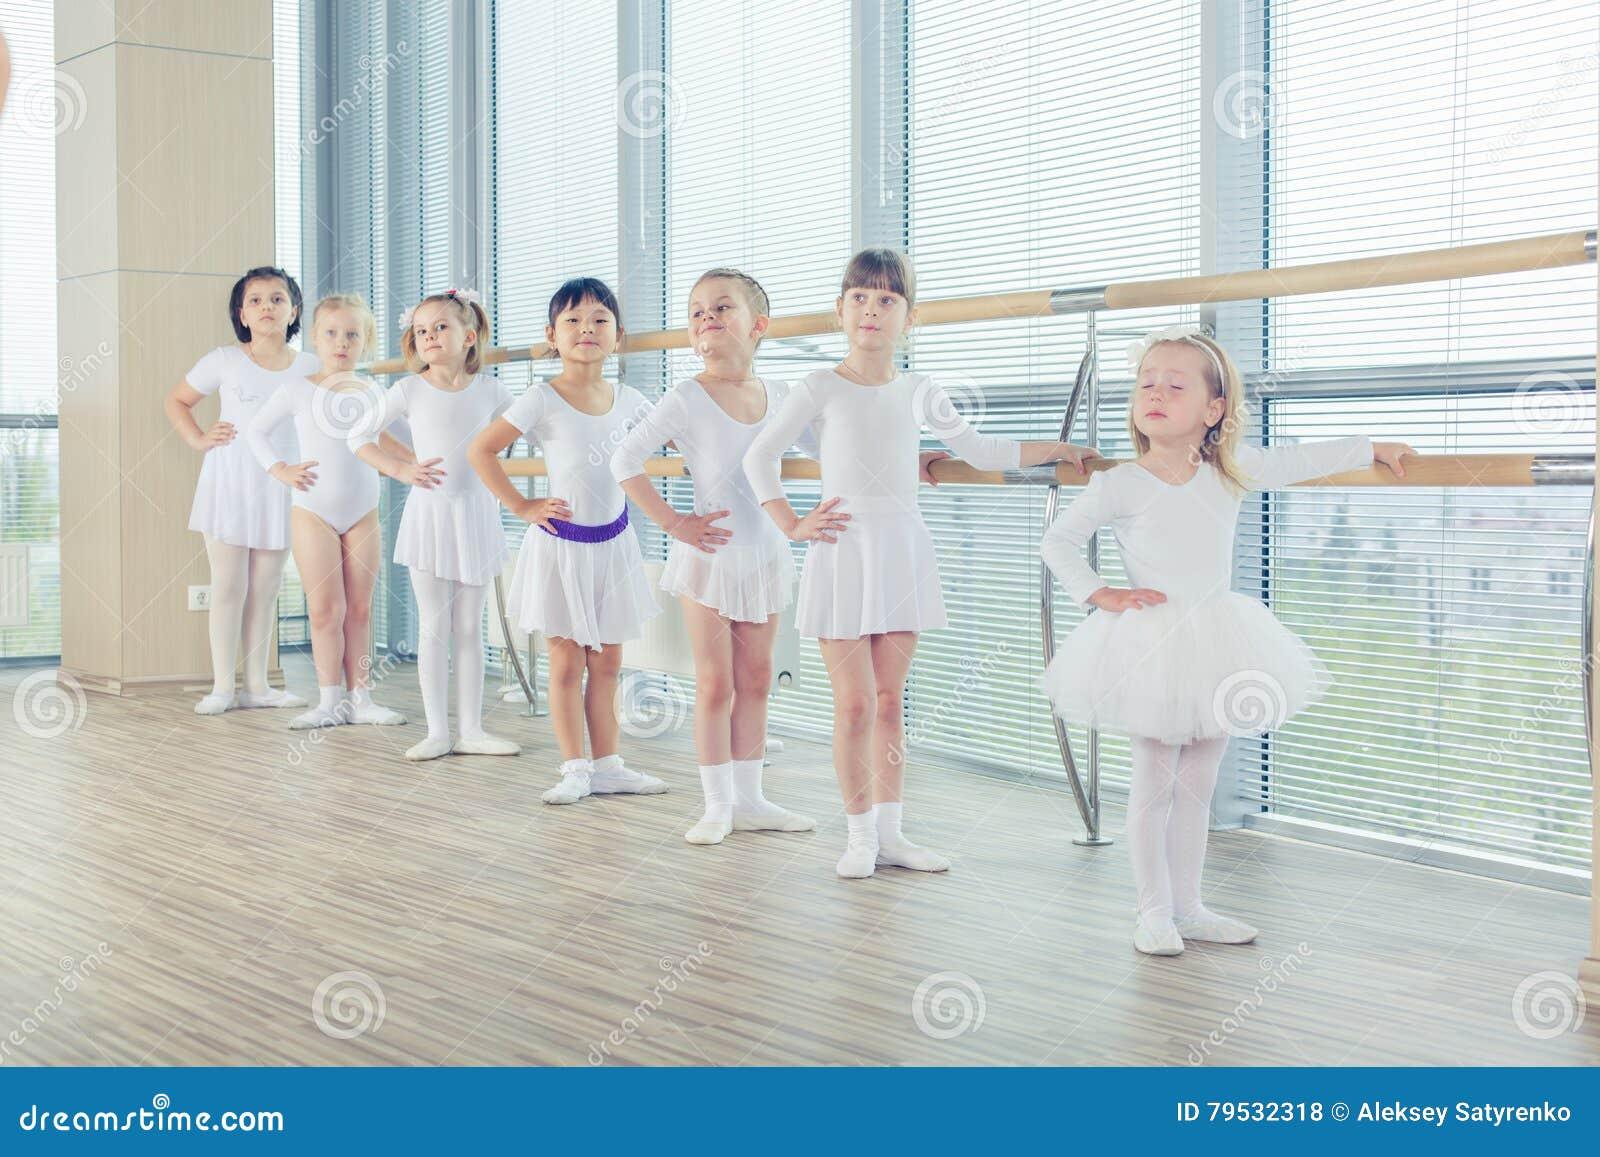 фото группа балерин